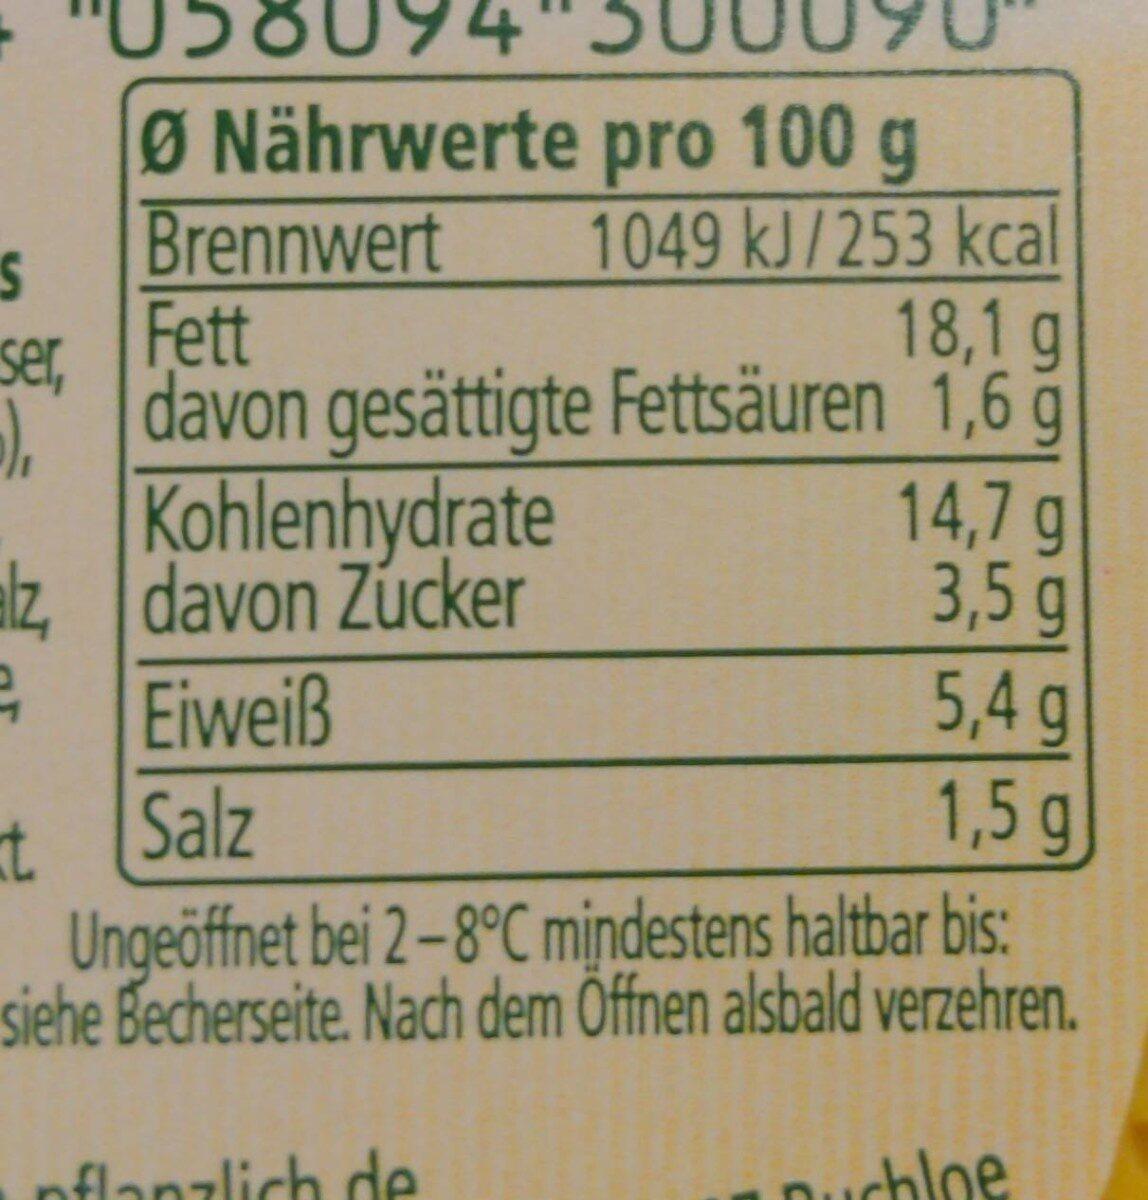 Hummus Süsskartoffel Kürbis - Nutrition facts - de